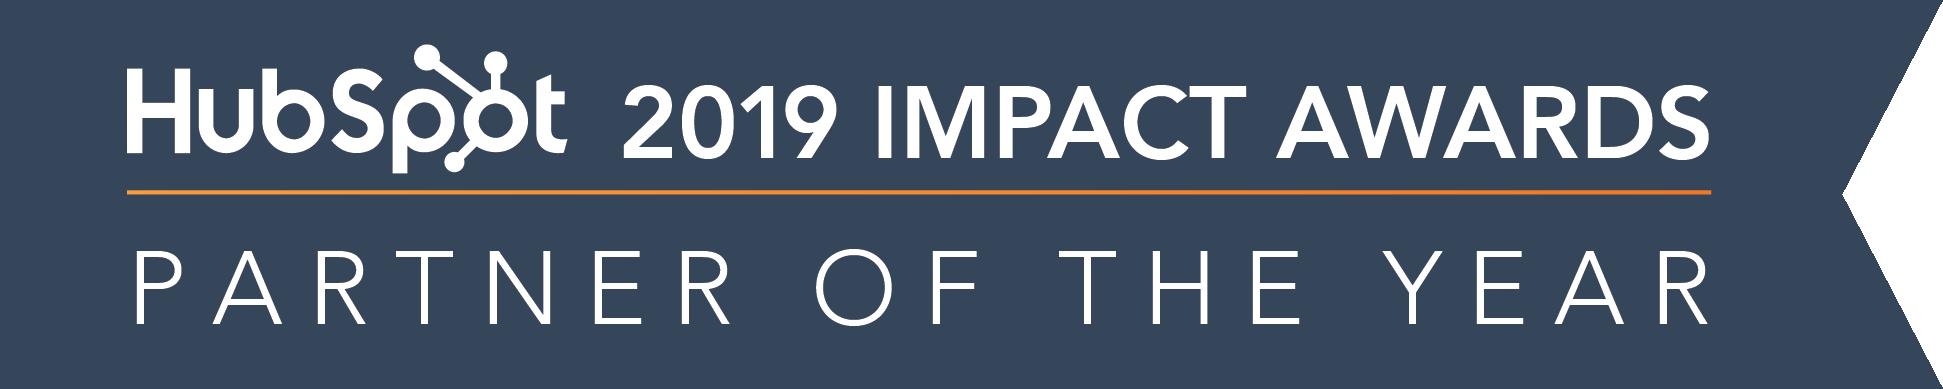 Hubspot_ImpactAwards_2019_PartnerOfTheYear-02